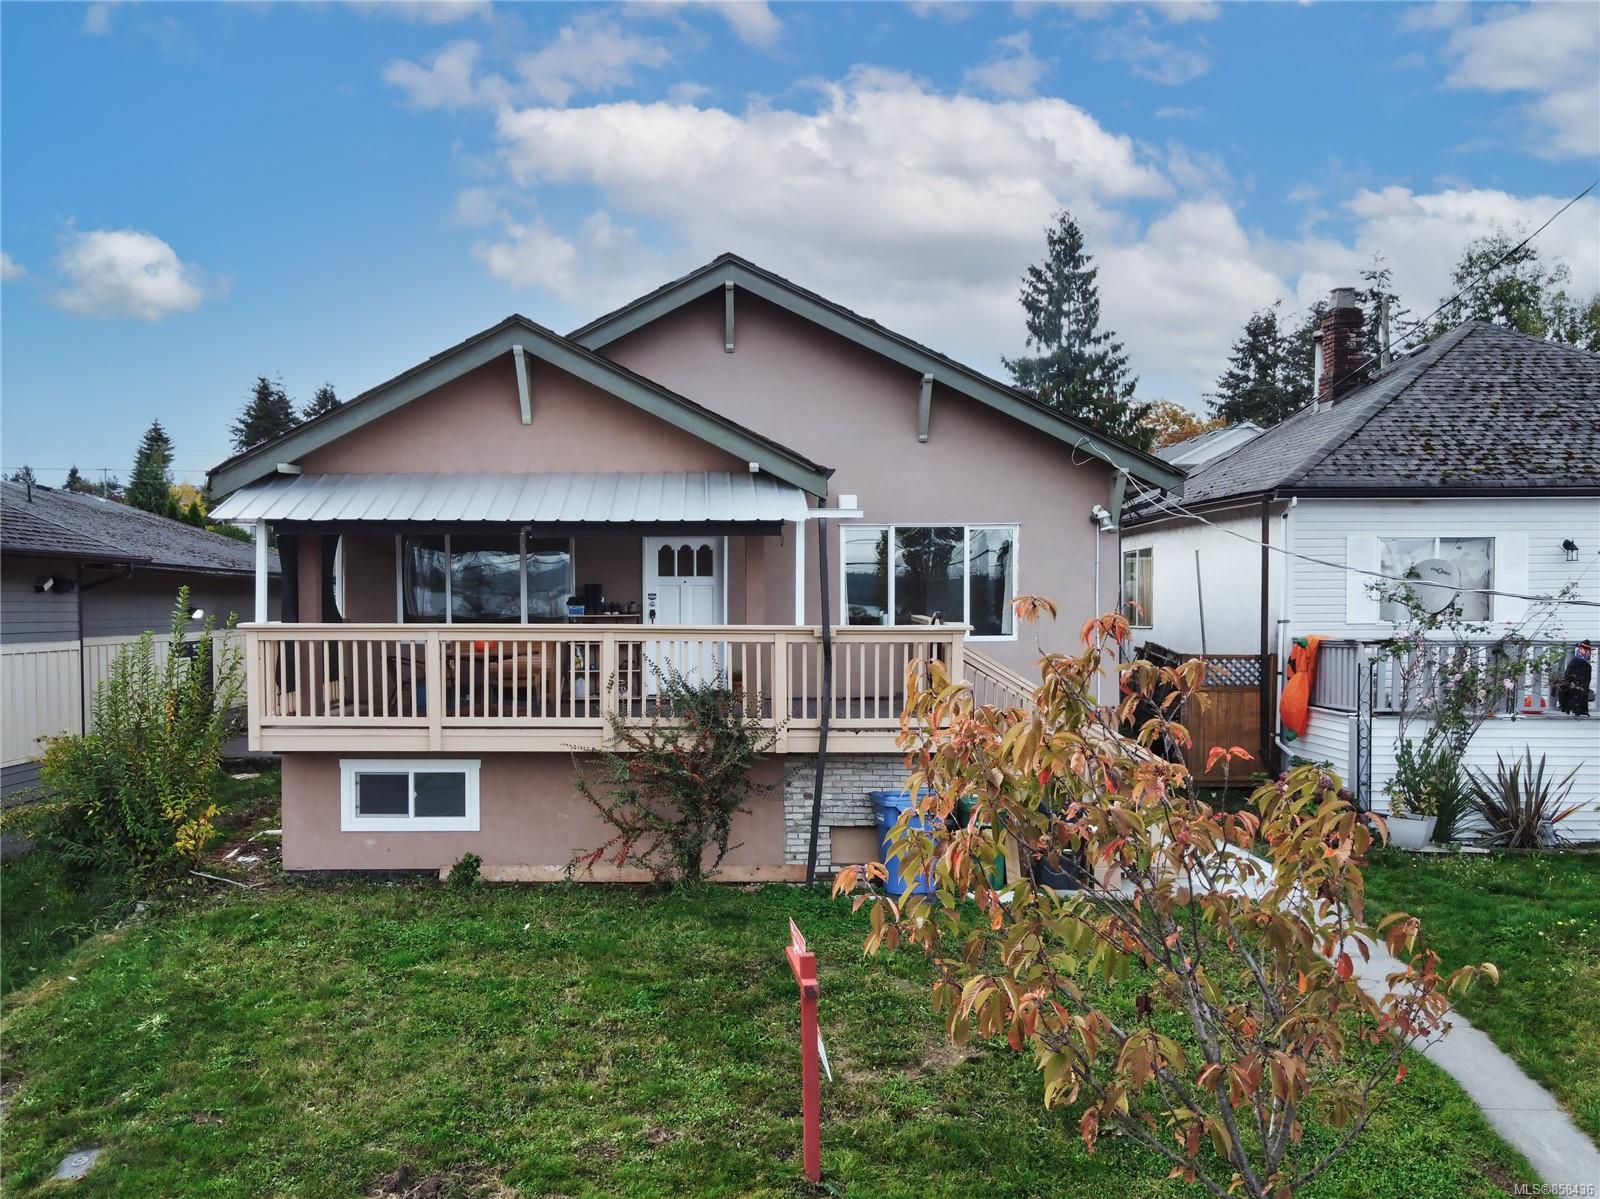 Main Photo: 494 Haliburton St in : Na South Nanaimo House for sale (Nanaimo)  : MLS®# 858436